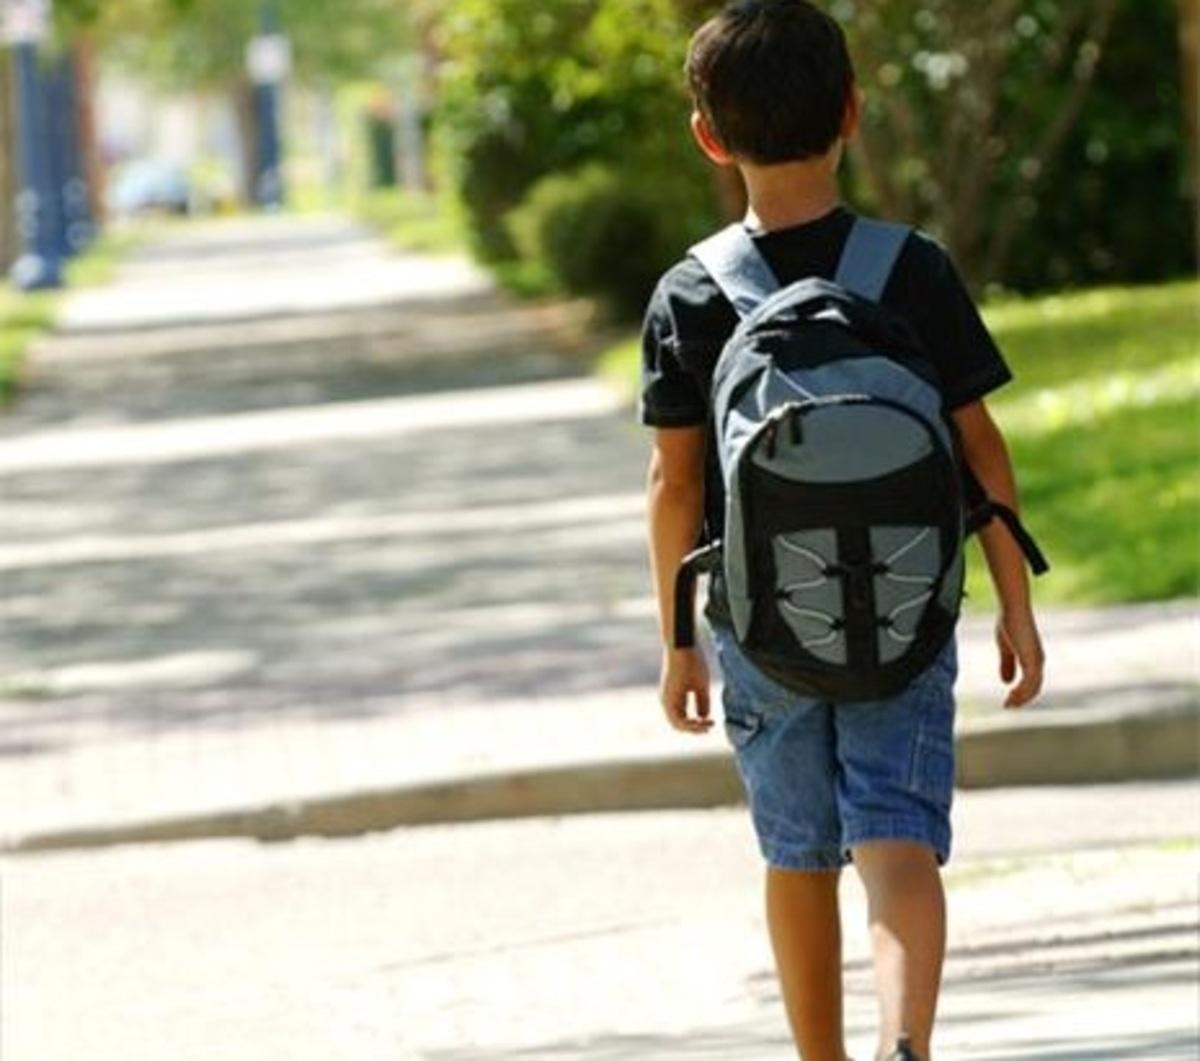 Unicef: Στα όρια της φτώχειας εκατοντάδες χιλιάδες παιδιά στην Ελλάδα | Newsit.gr